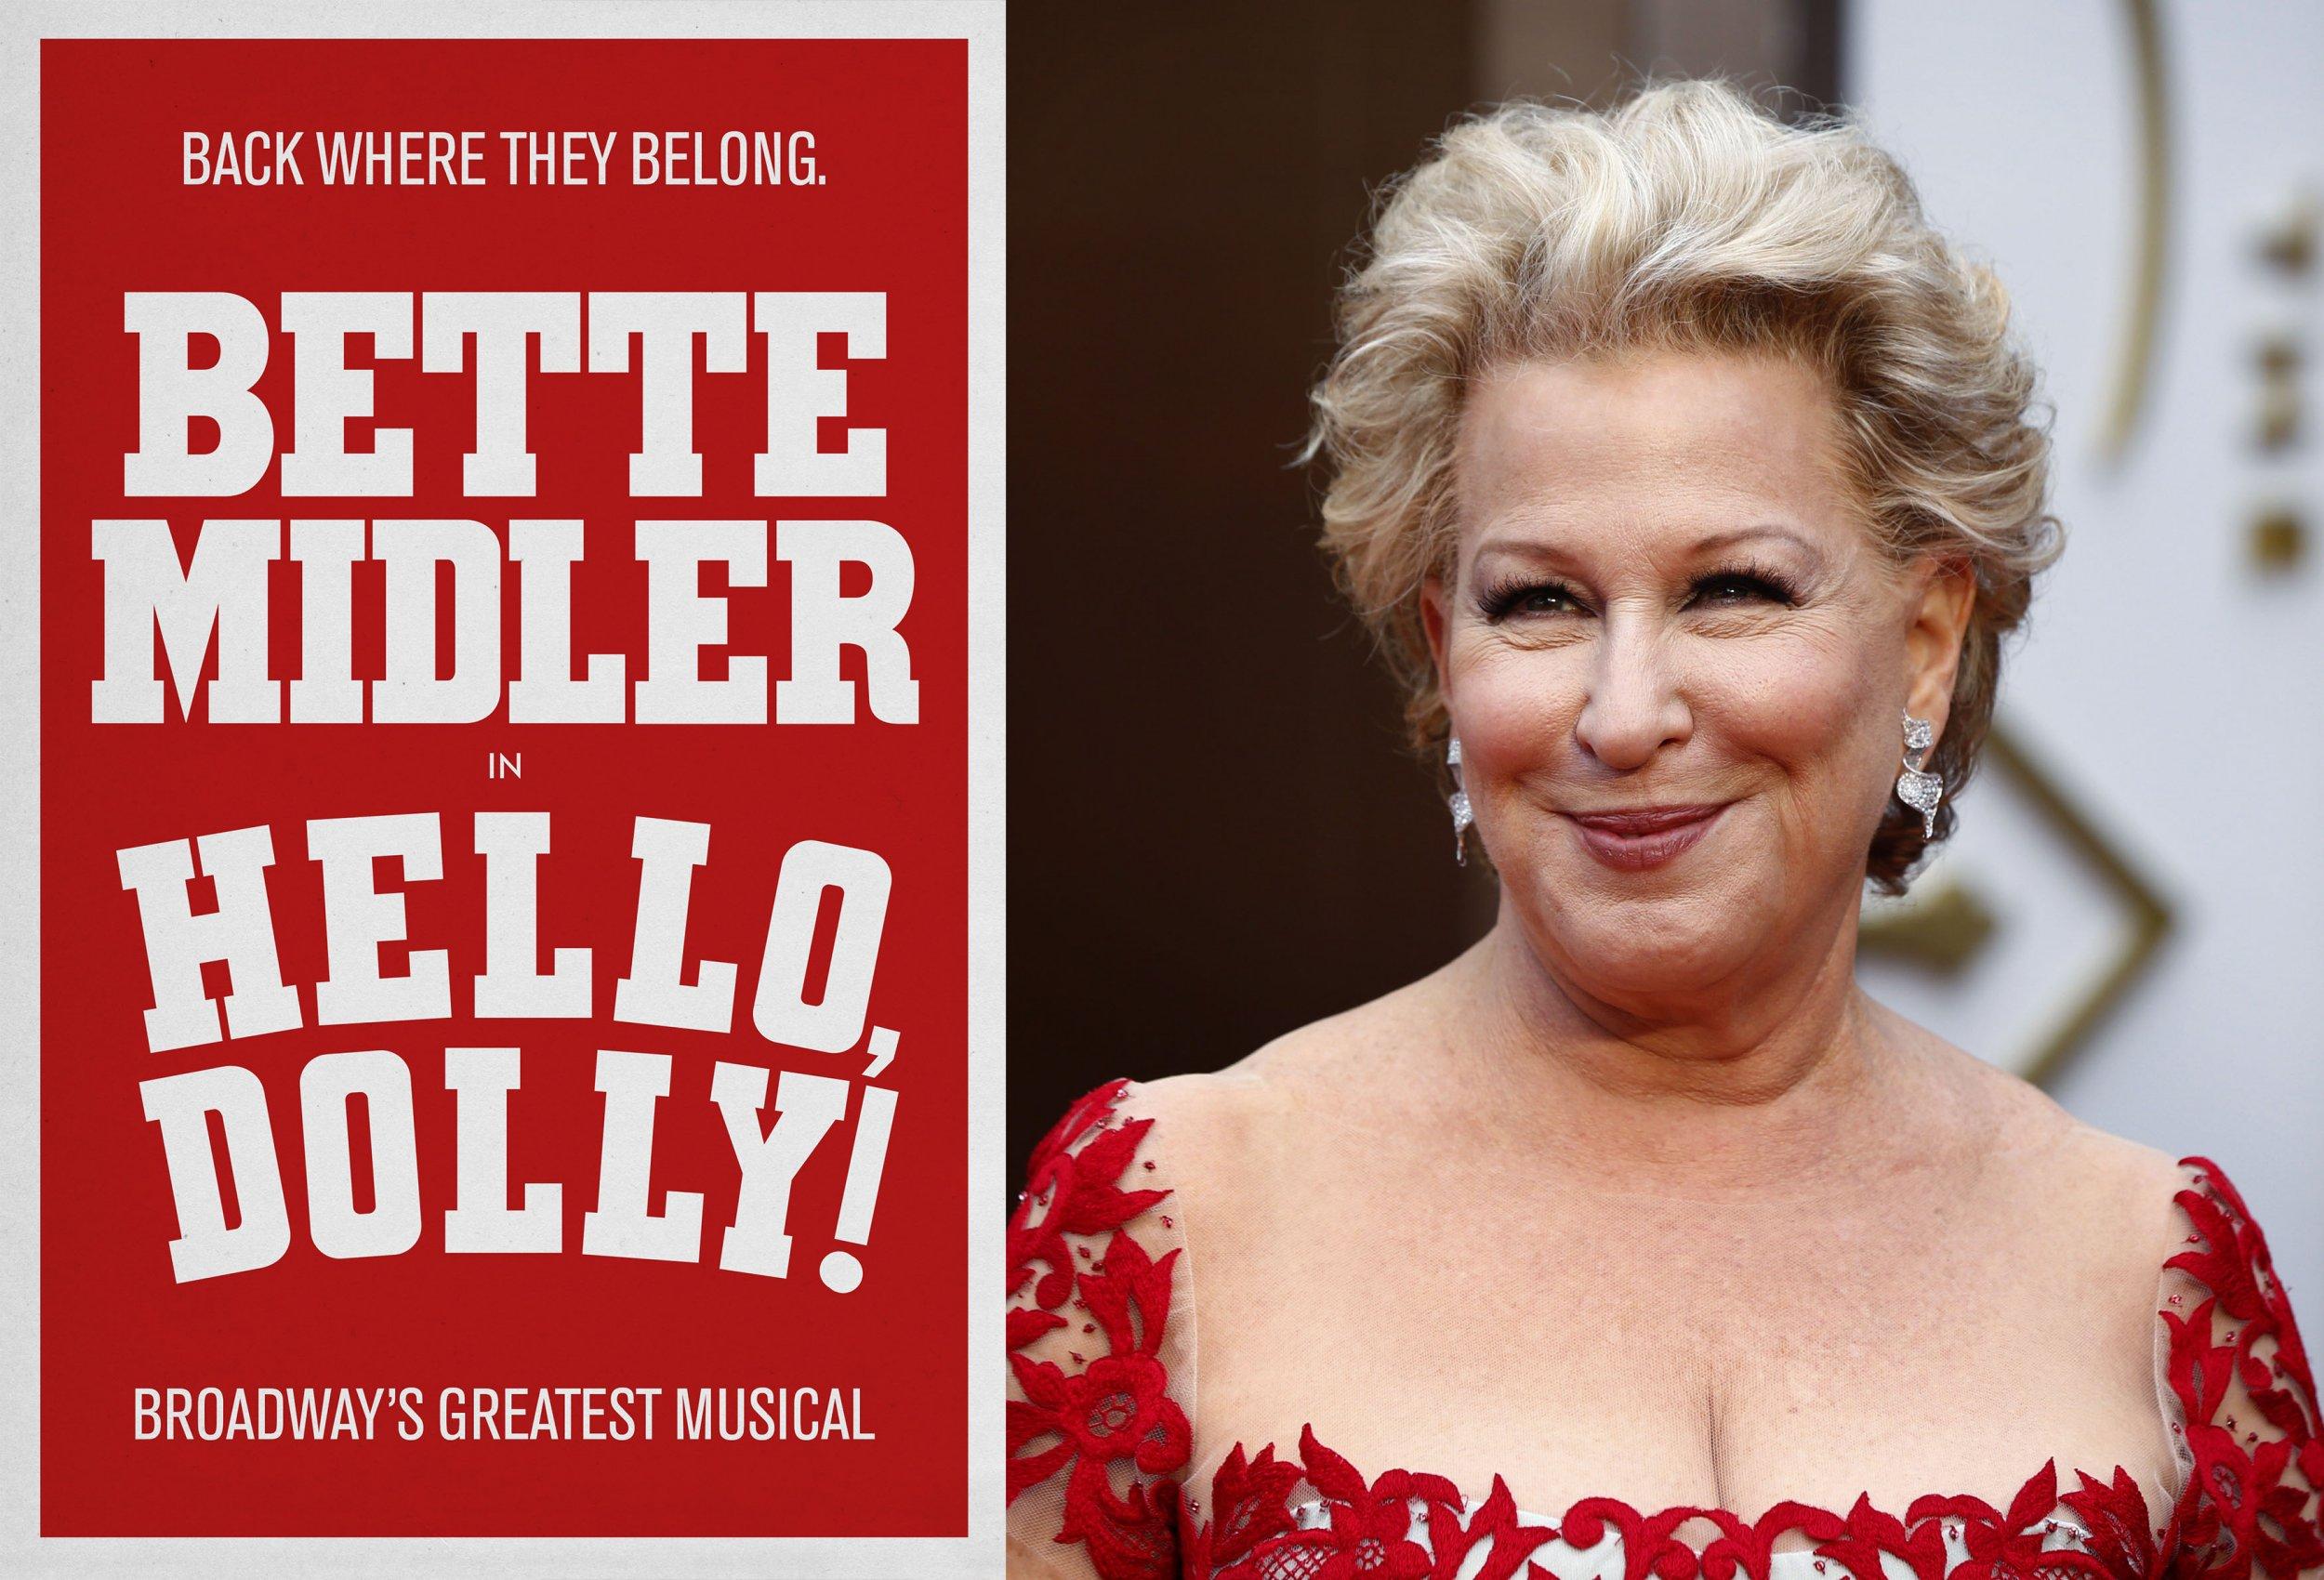 Lyric barbra streisand hello dolly lyrics : Bette Midler to Star in the Broadway Revival of 'Hello, Dolly!'